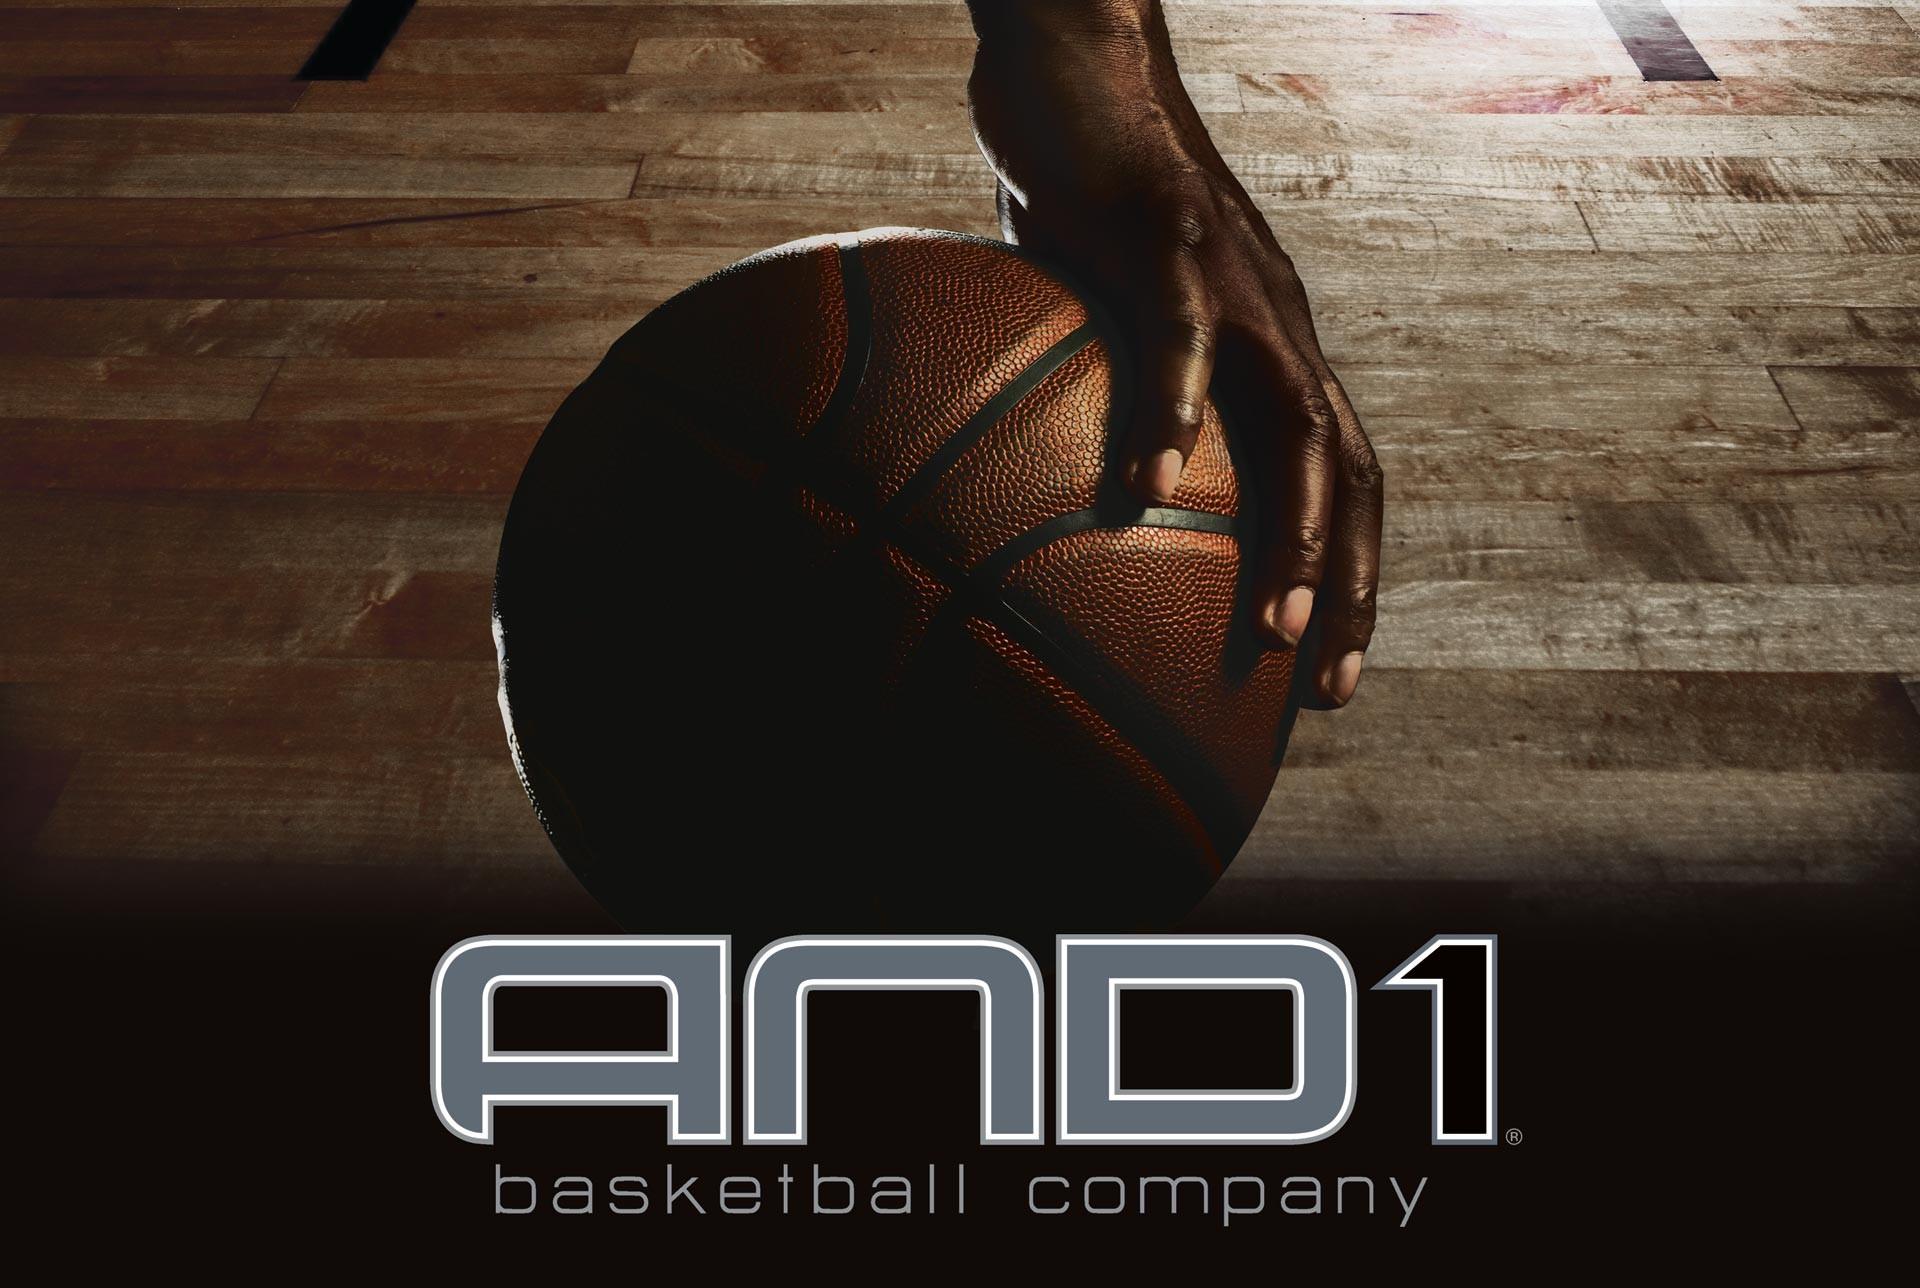 hd basketball wallpaper. Â«Â«